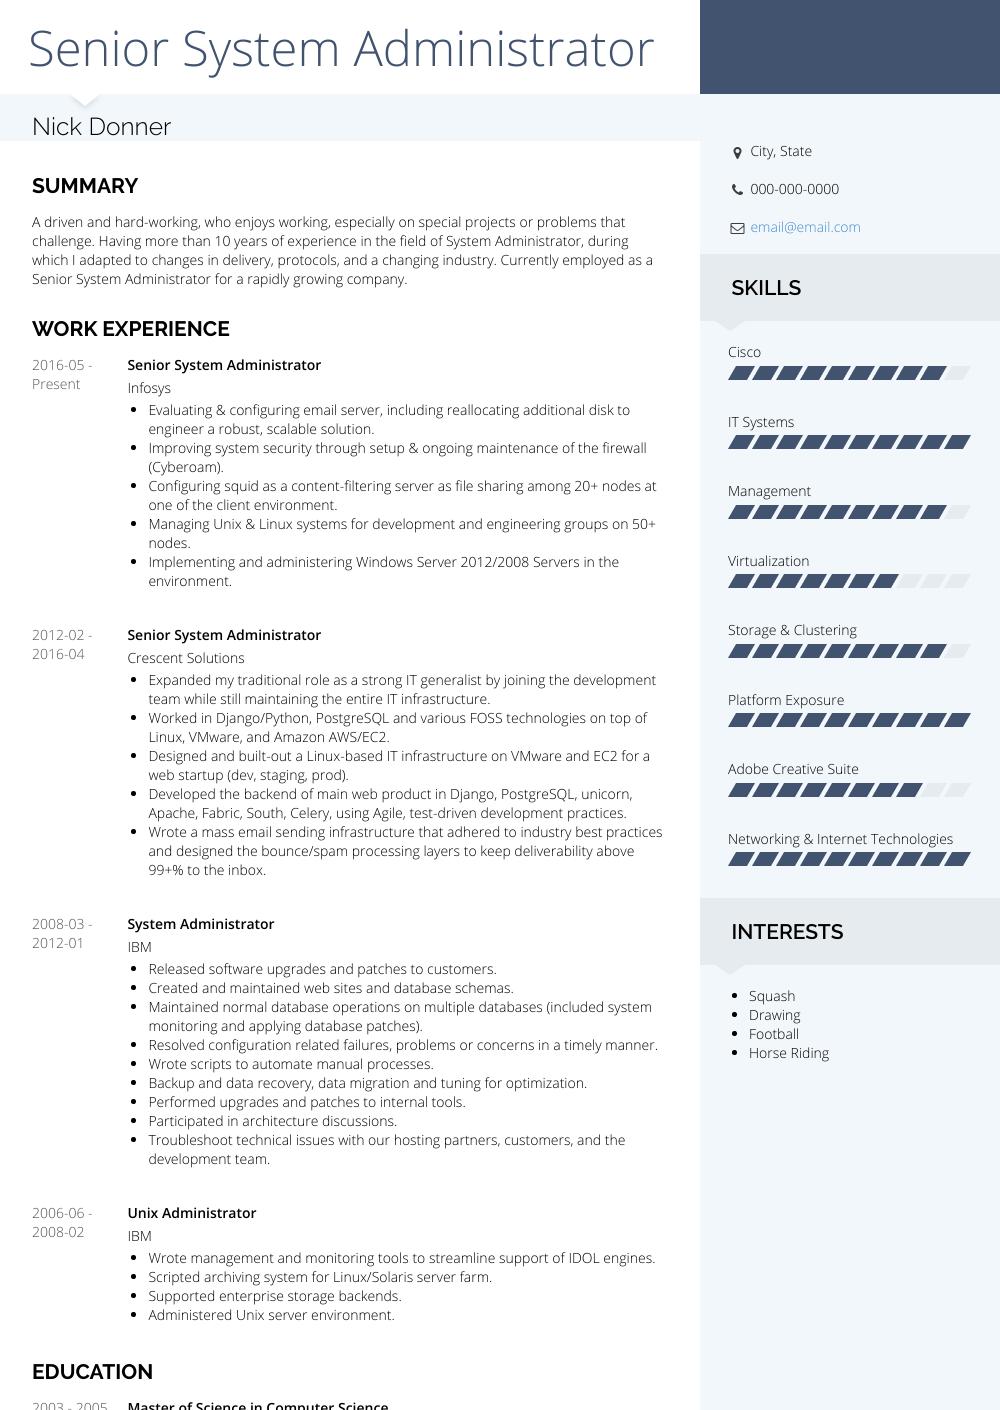 senior system administrator resume template